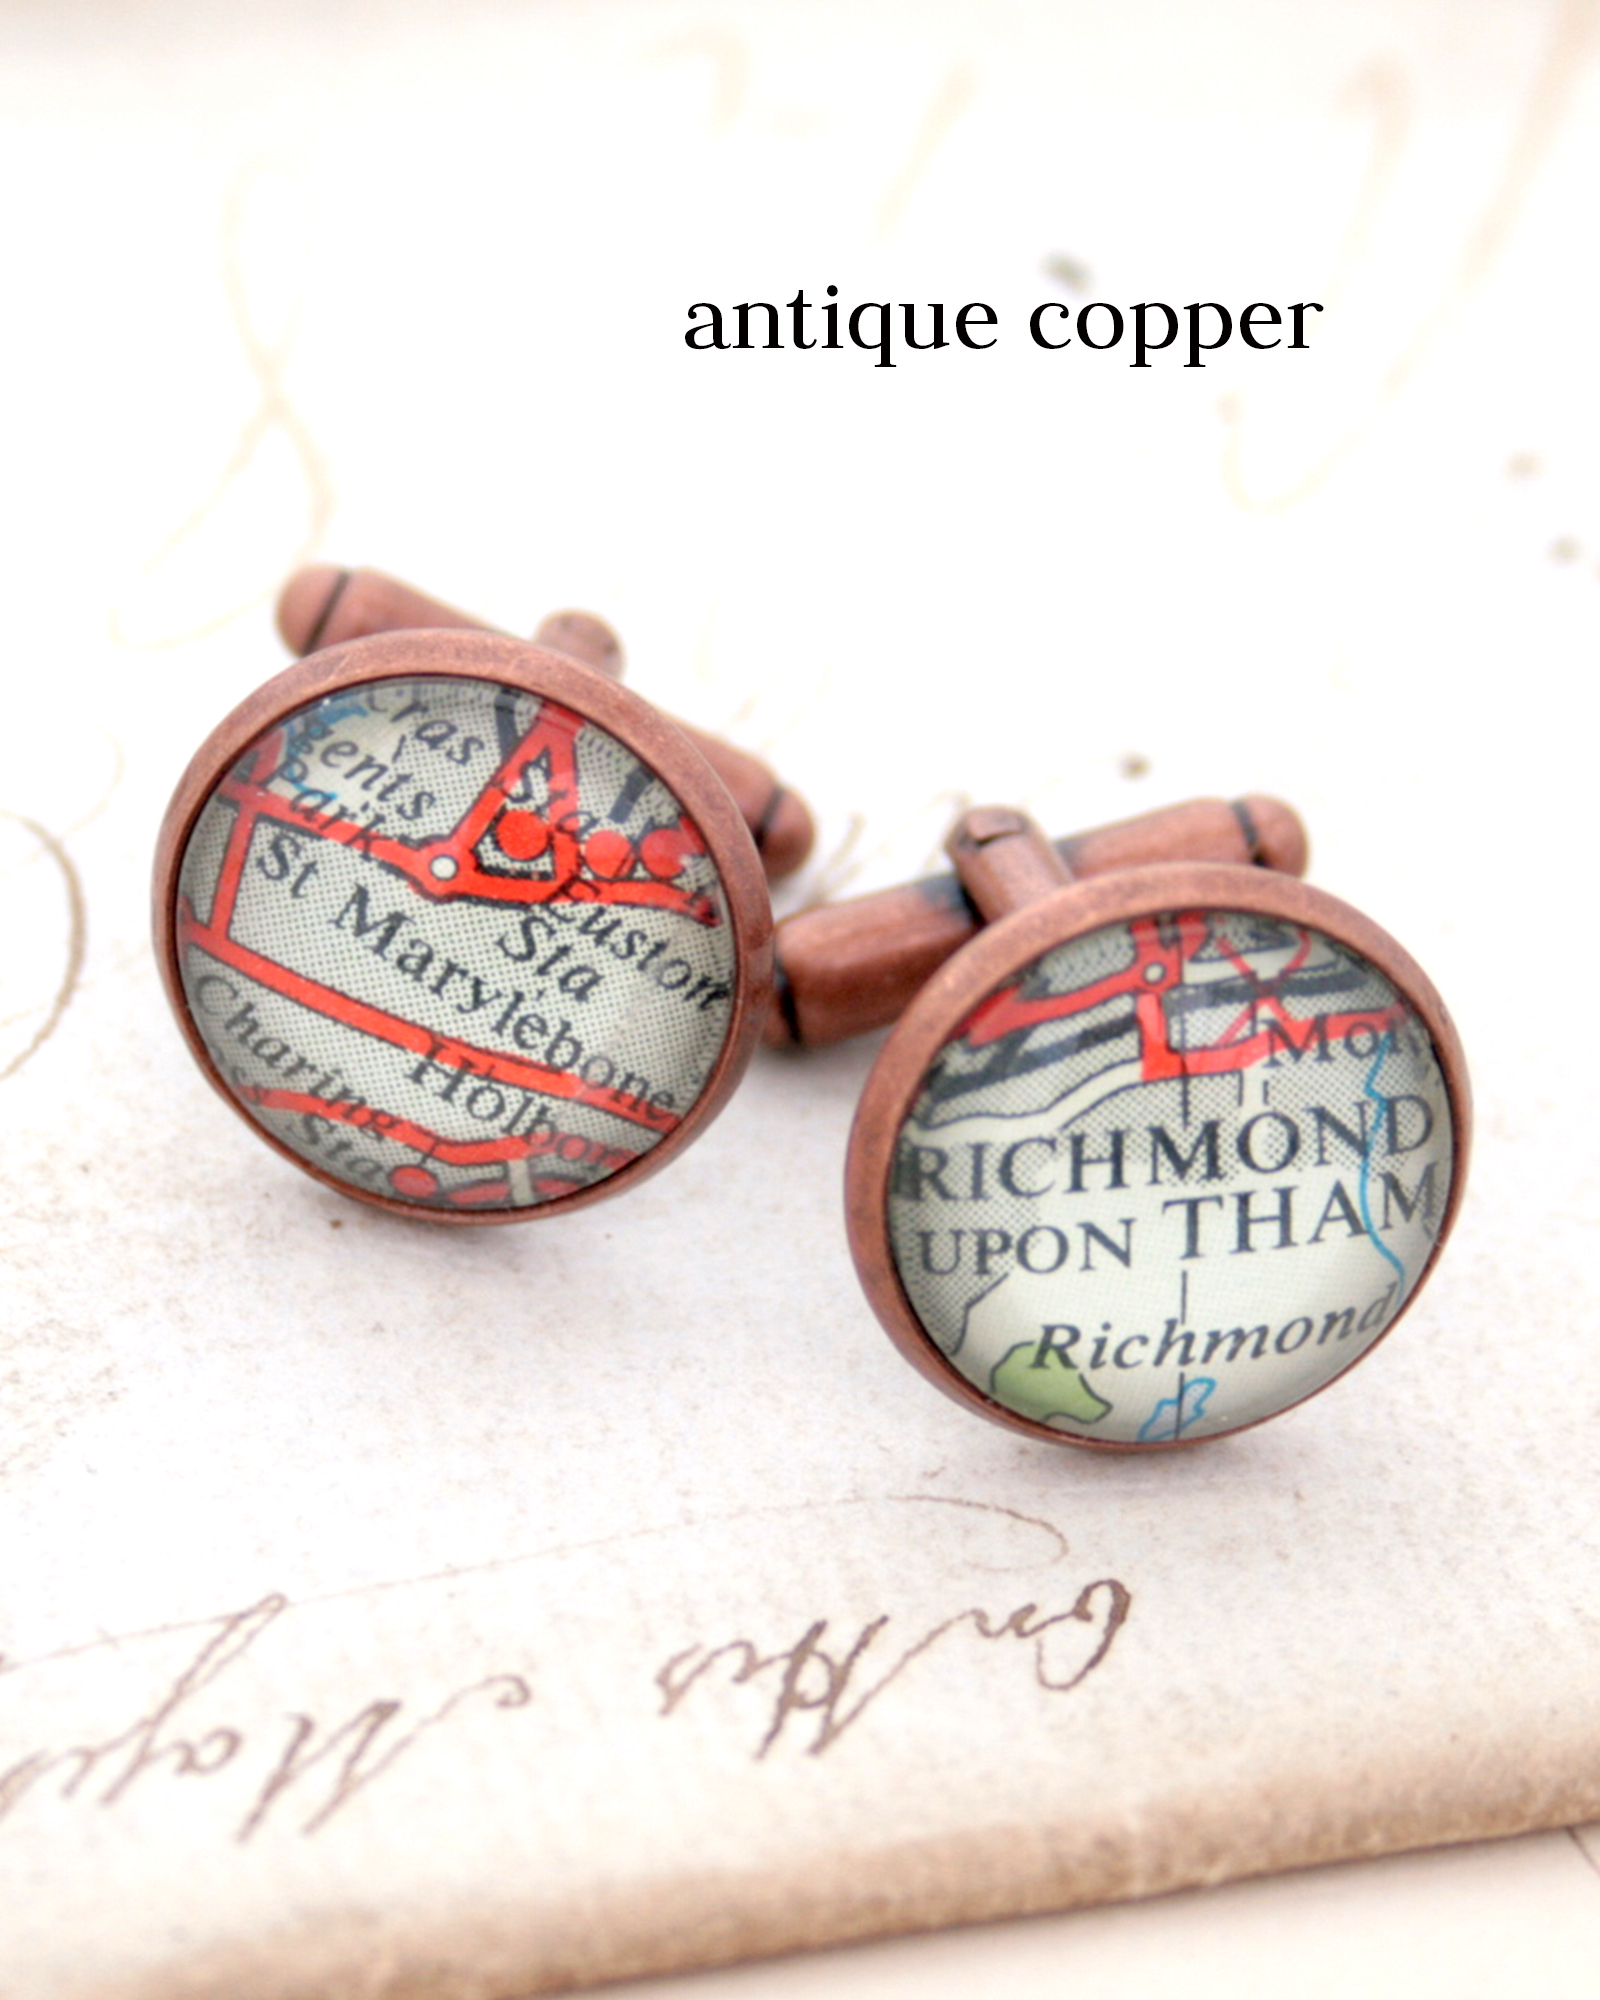 custom map cufflinks in antique copper colour